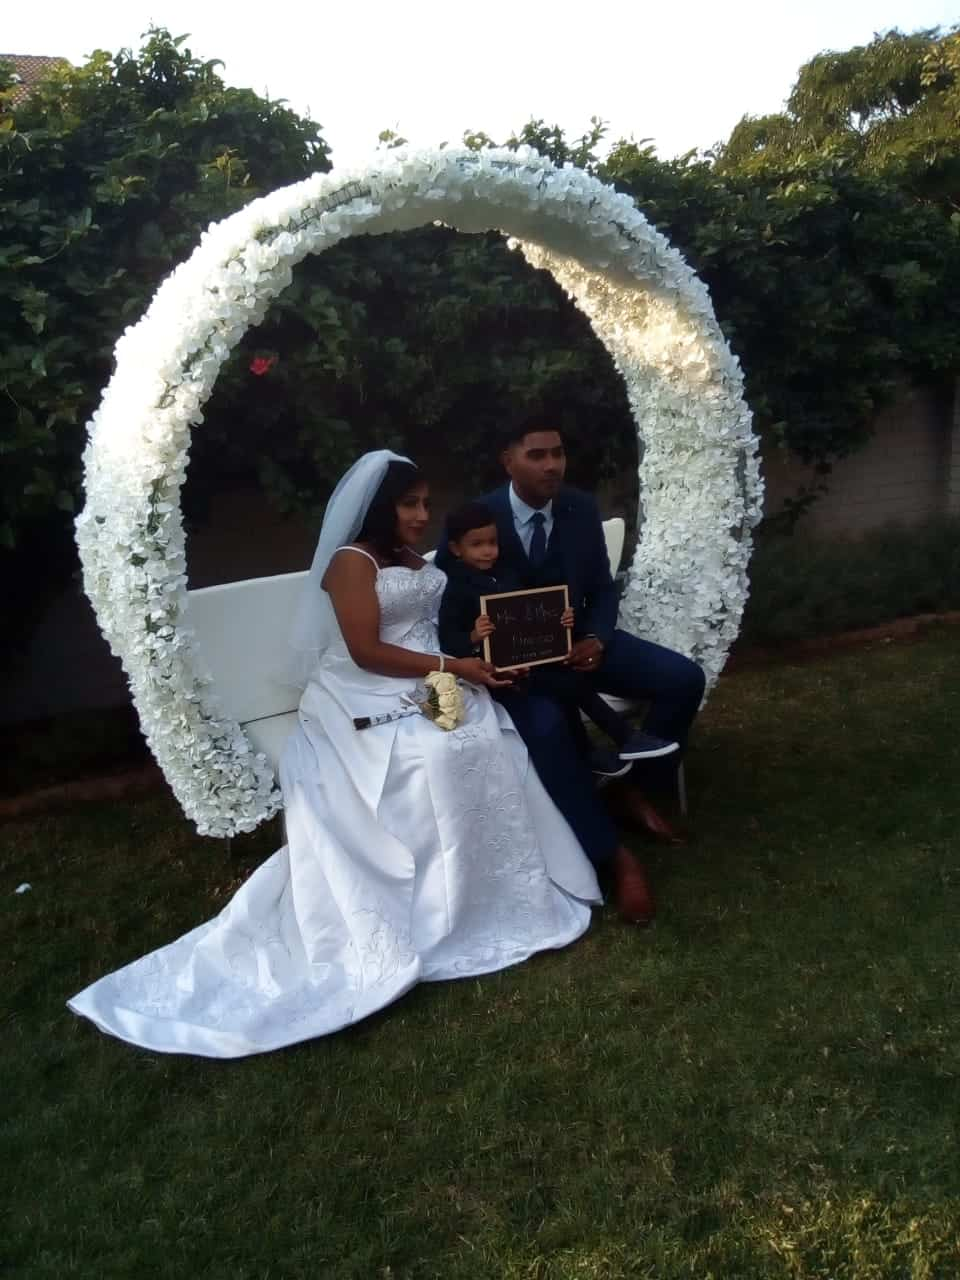 Bride and groom sittign on a flower arch